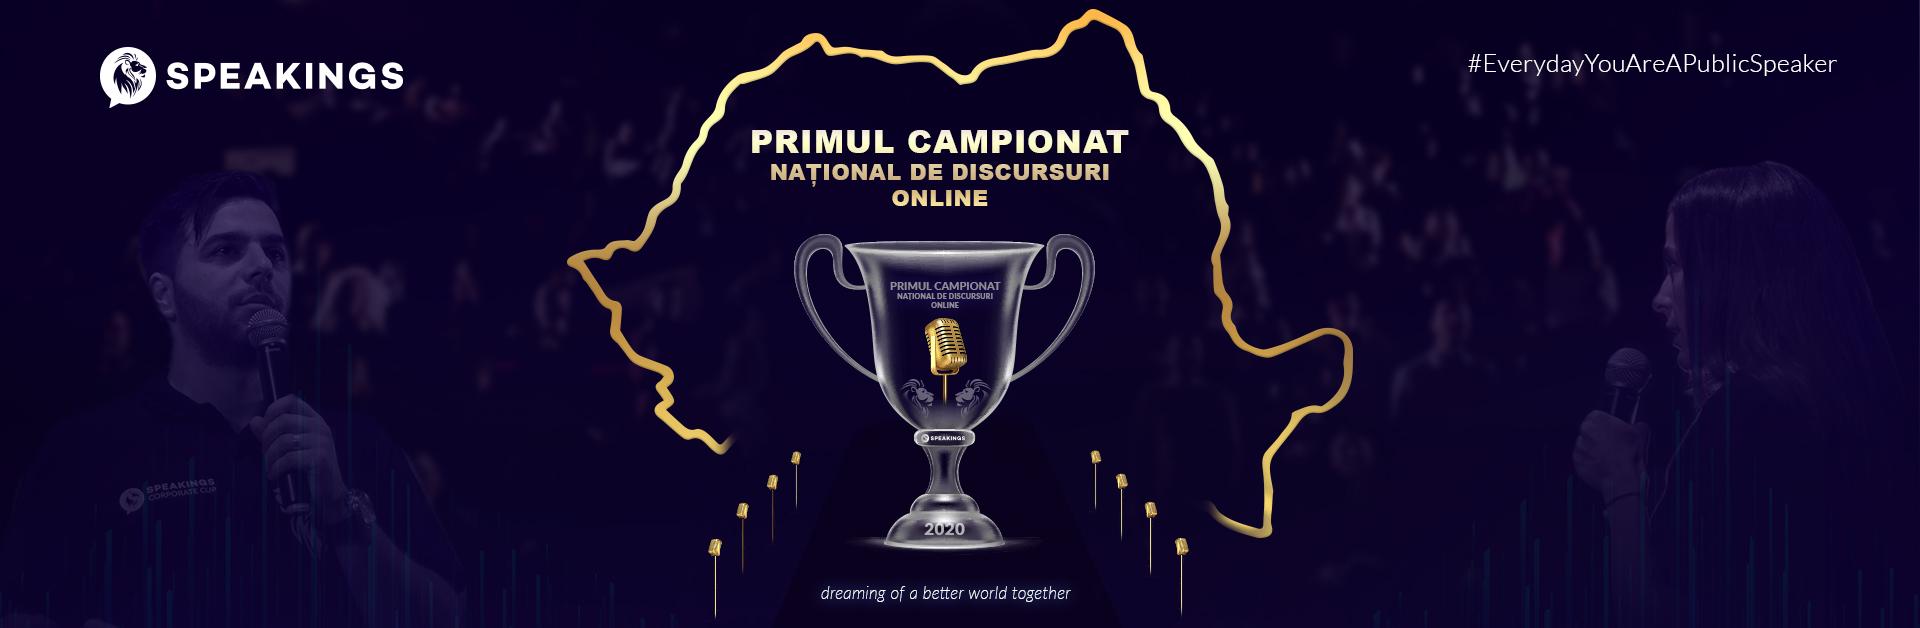 Primul Campionat National de Discursuri Online